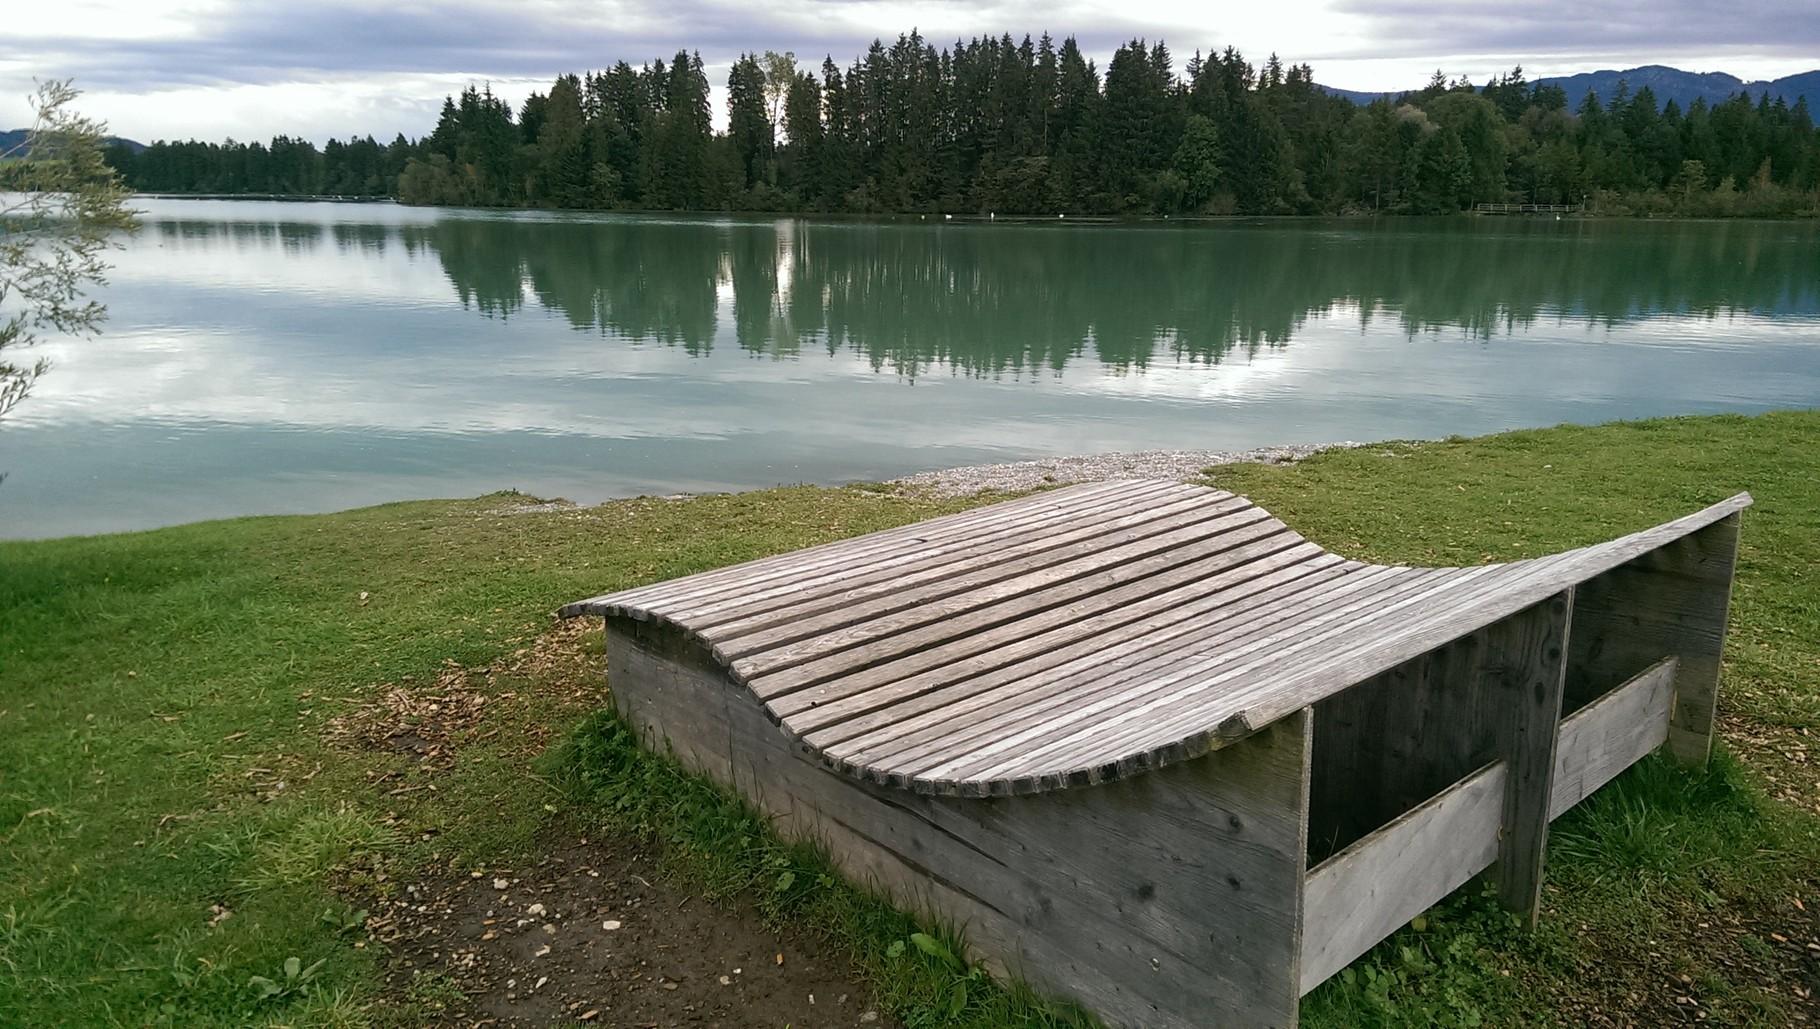 Chillen am Lechsee